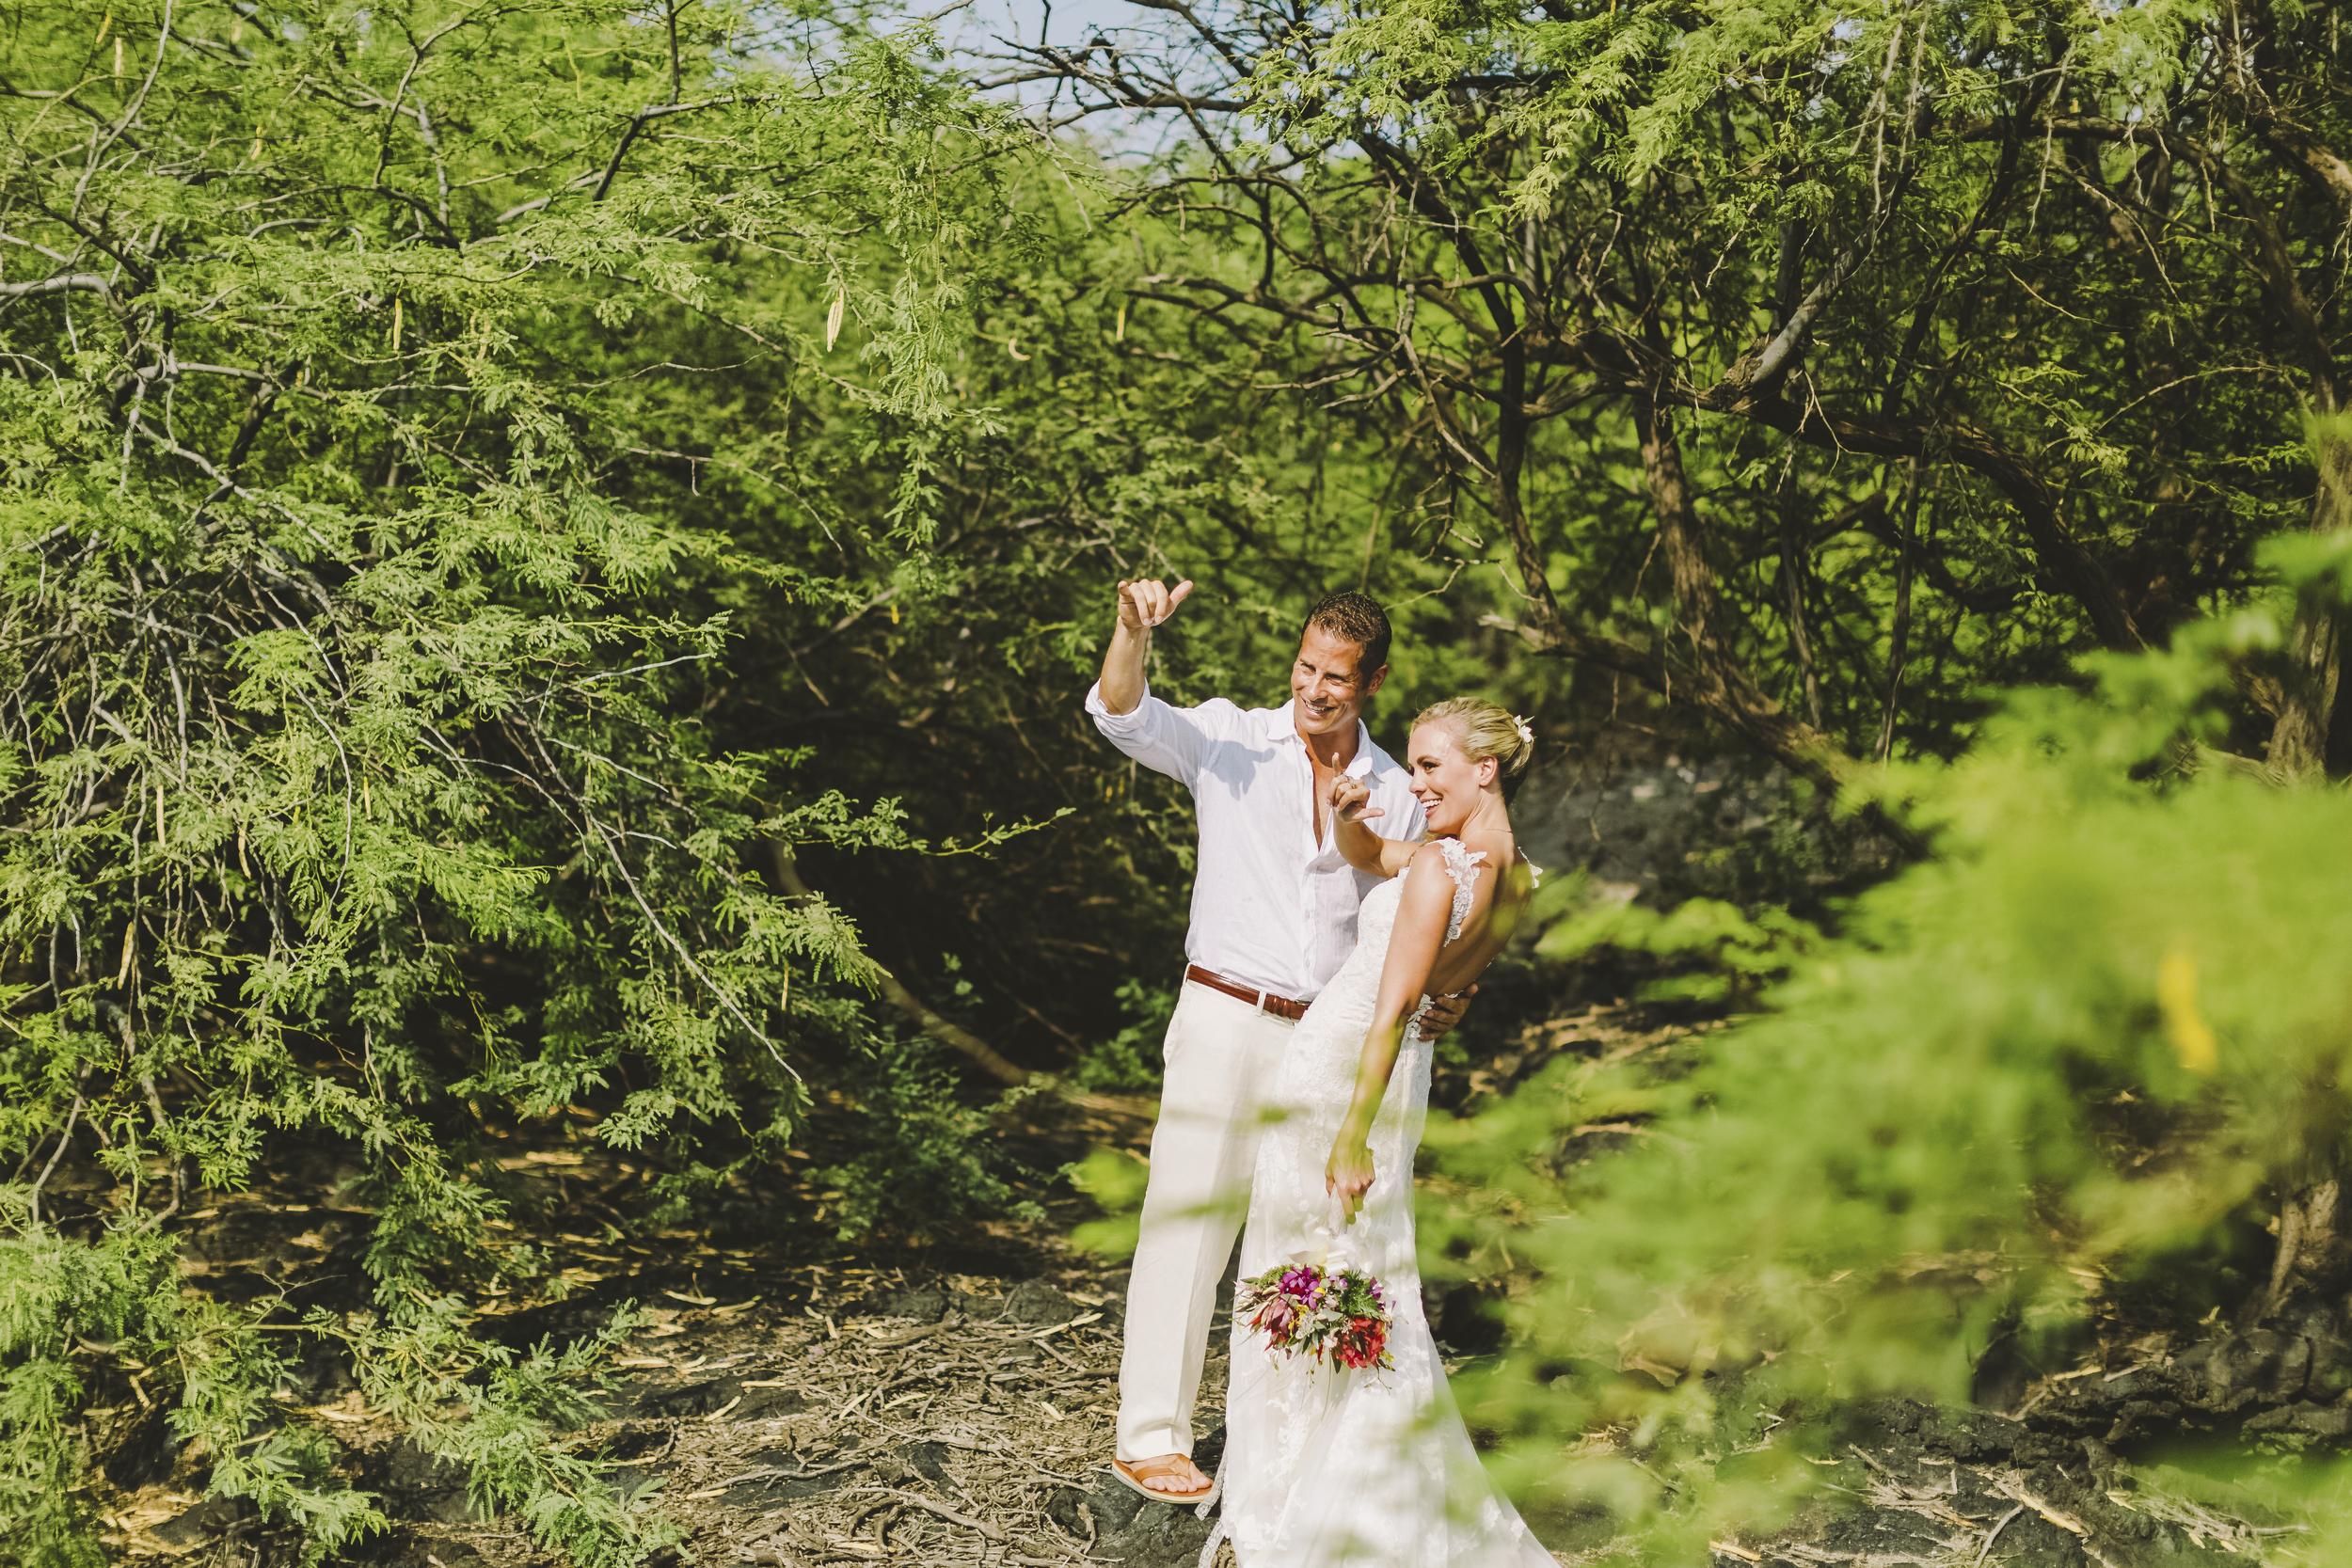 angie-diaz-photography-hawaii-wedding-photographer-kelli-jay-36.jpg